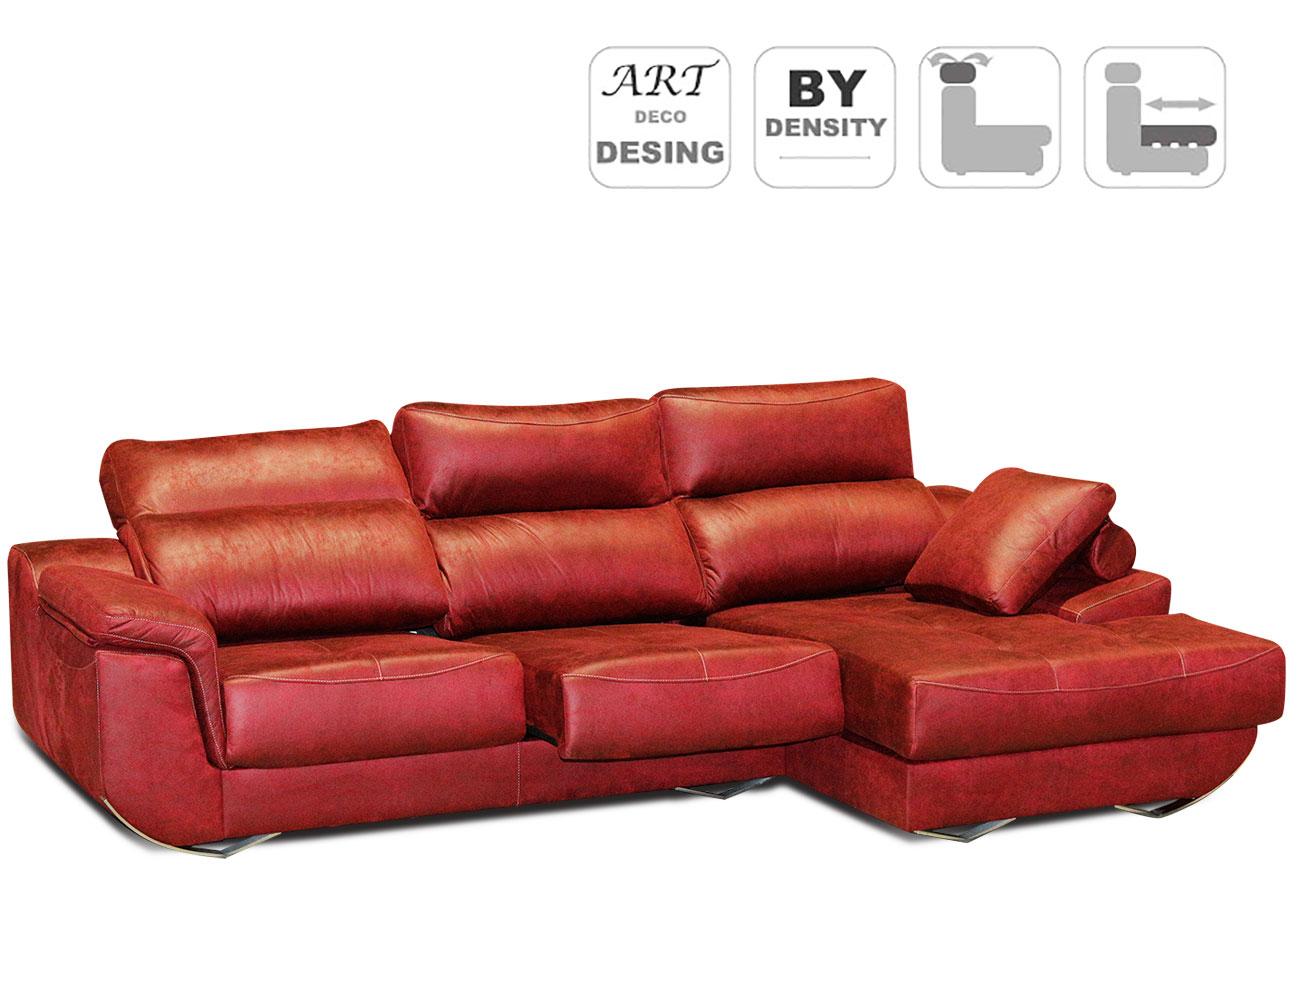 Sofa chaiselongue rojo granate moderno detalle